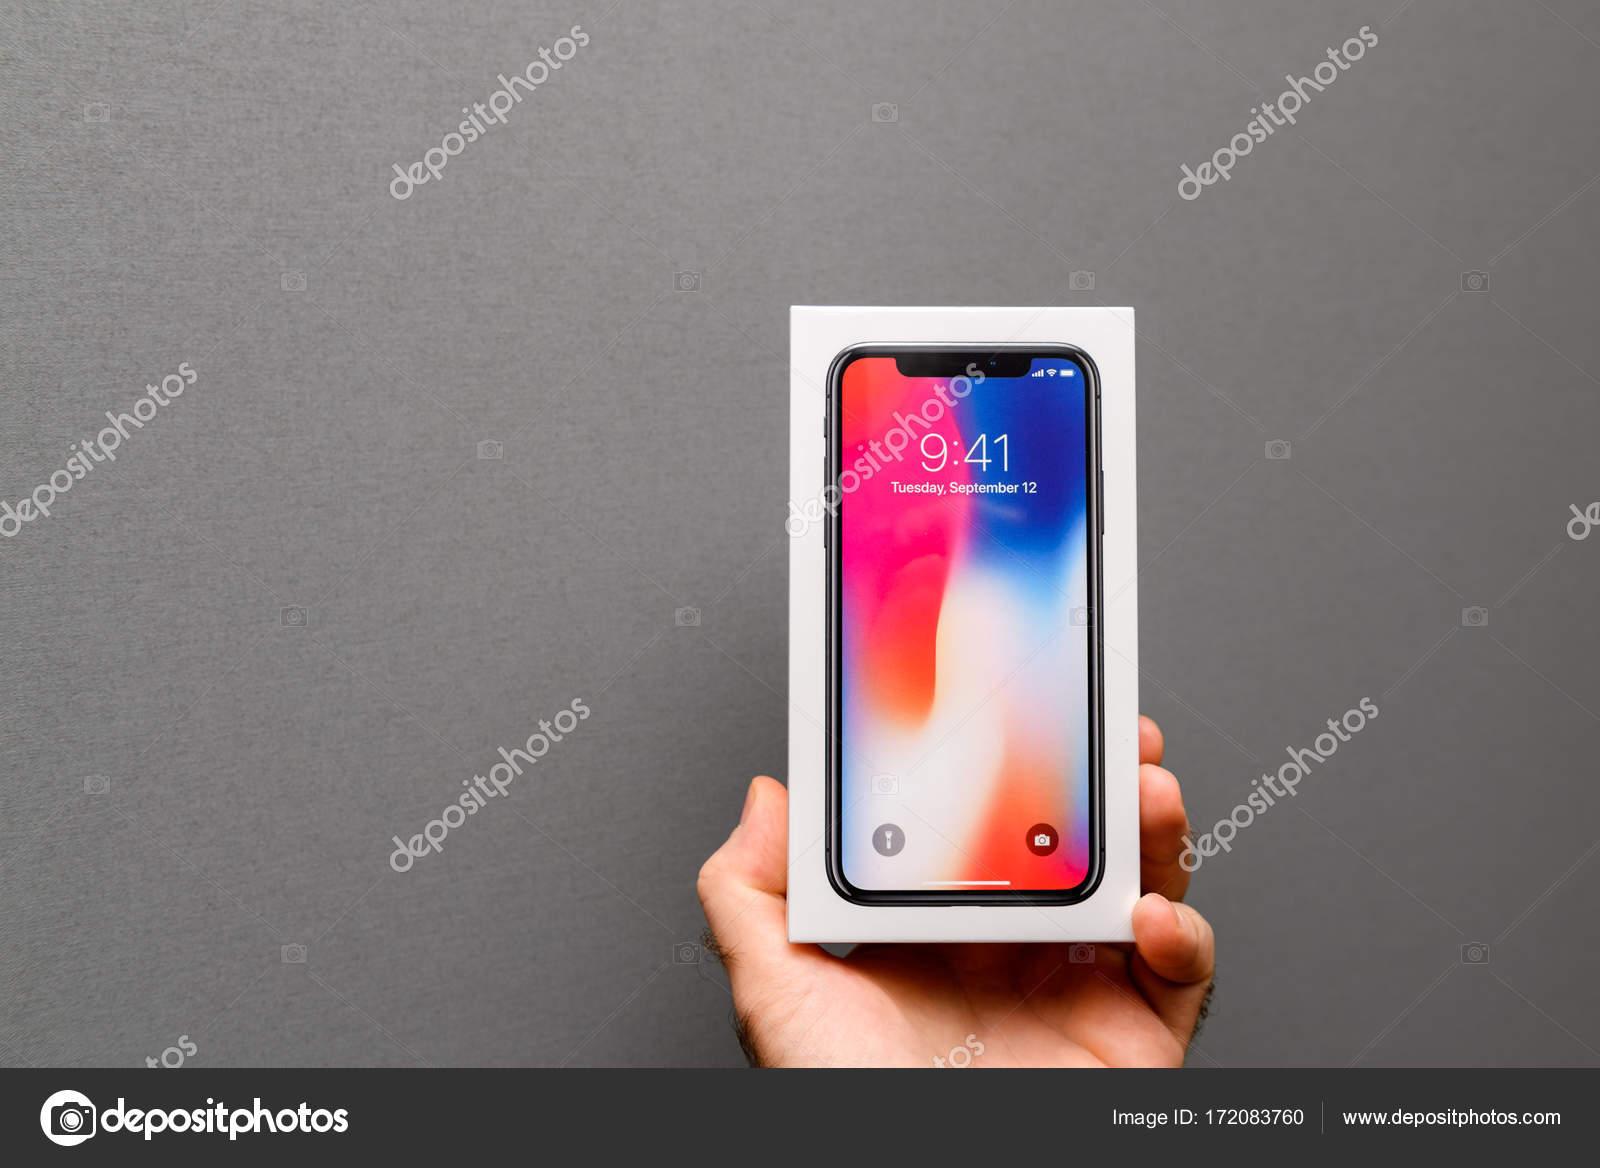 Apple Iphone X10 Su Sfondo Grigio Foto Editoriale Stock